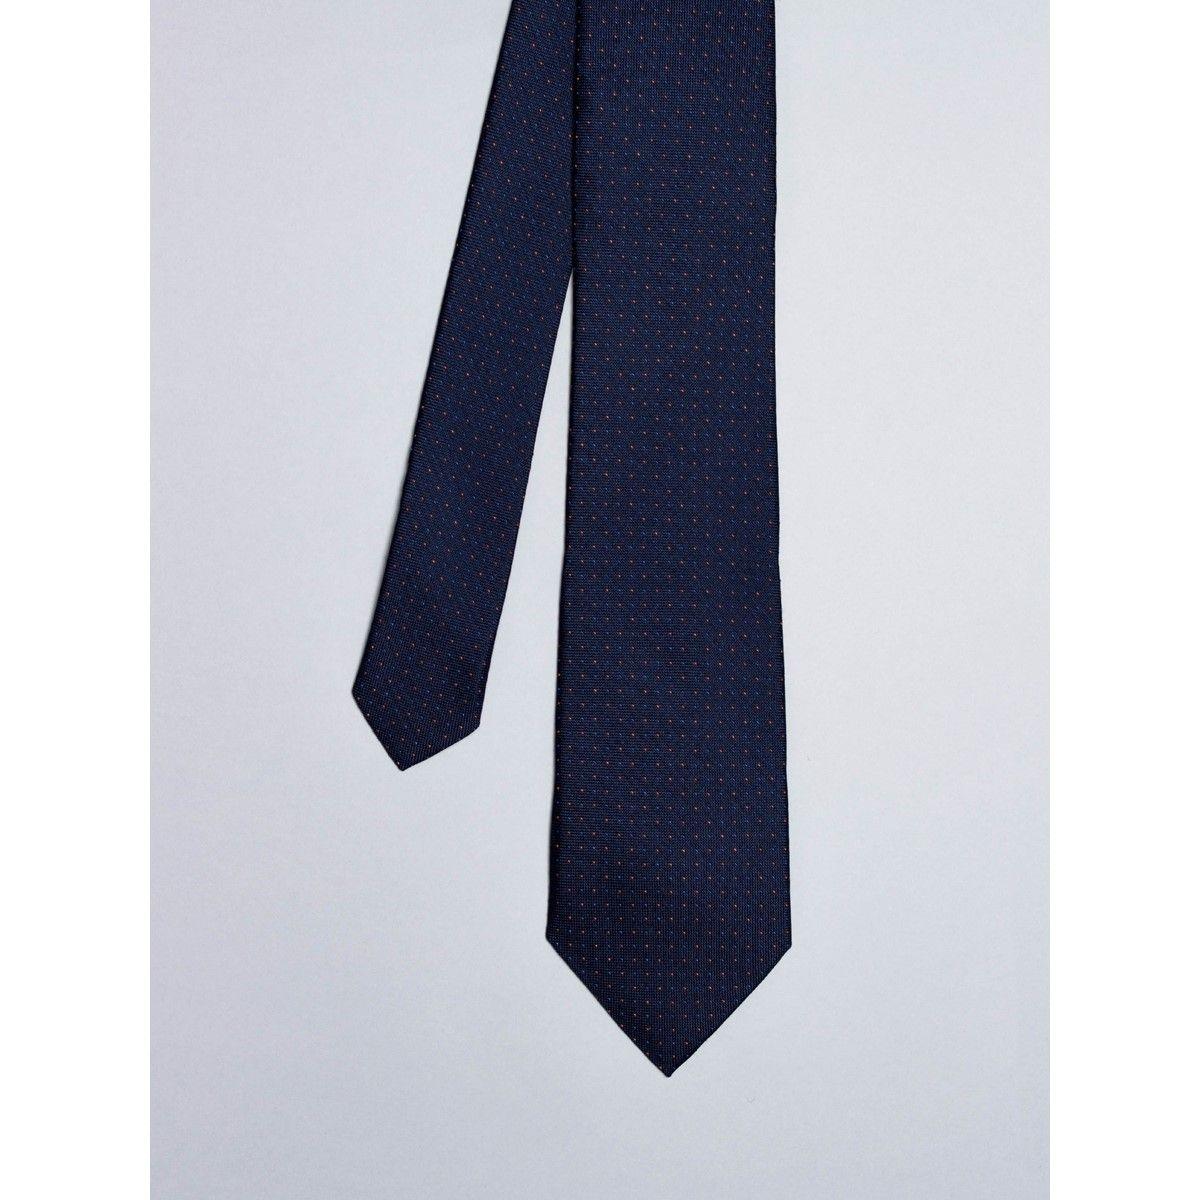 Cravate bleu nuit avec micro pois orange et bleus